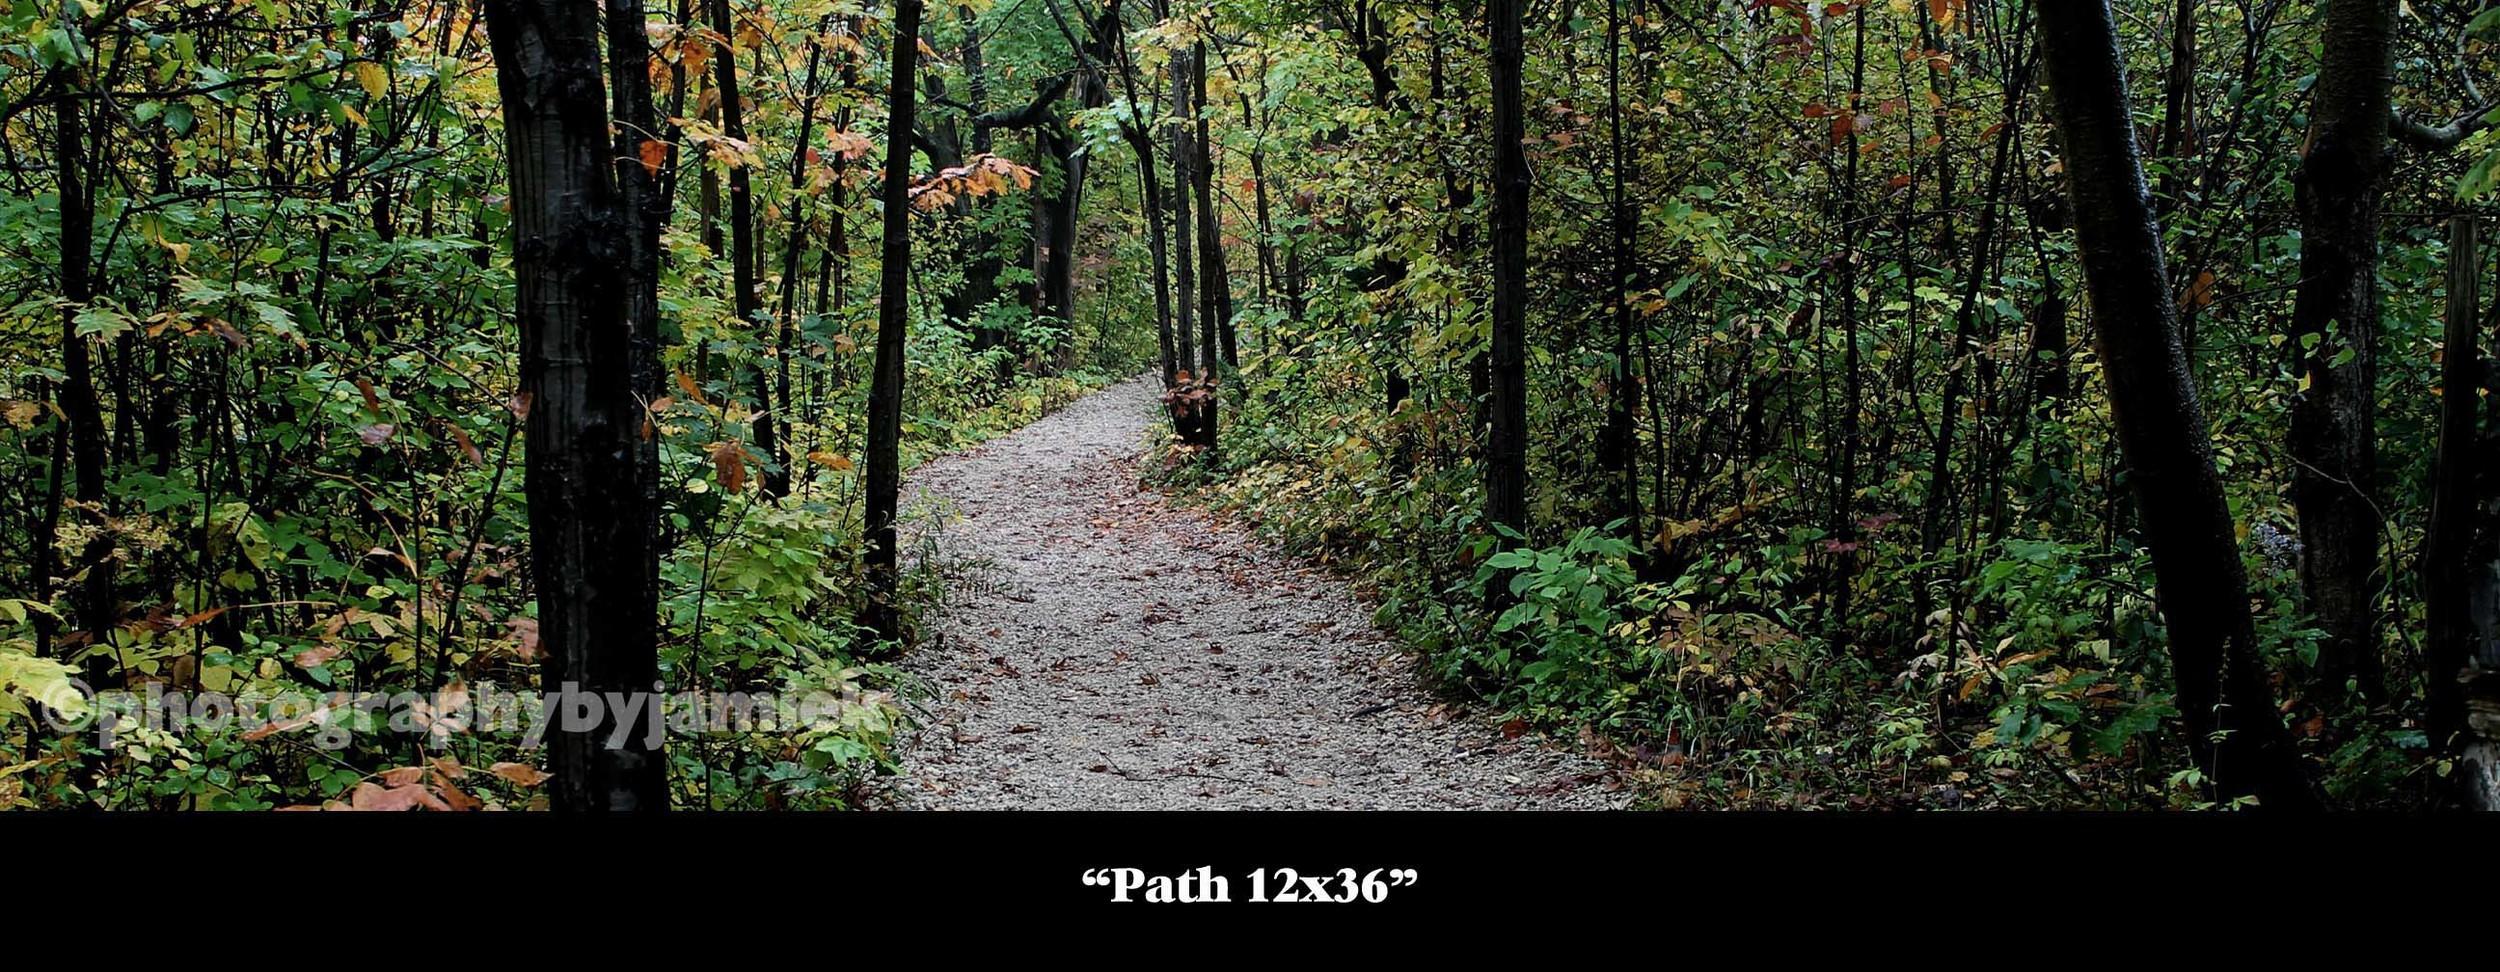 Path 12x36.jpg